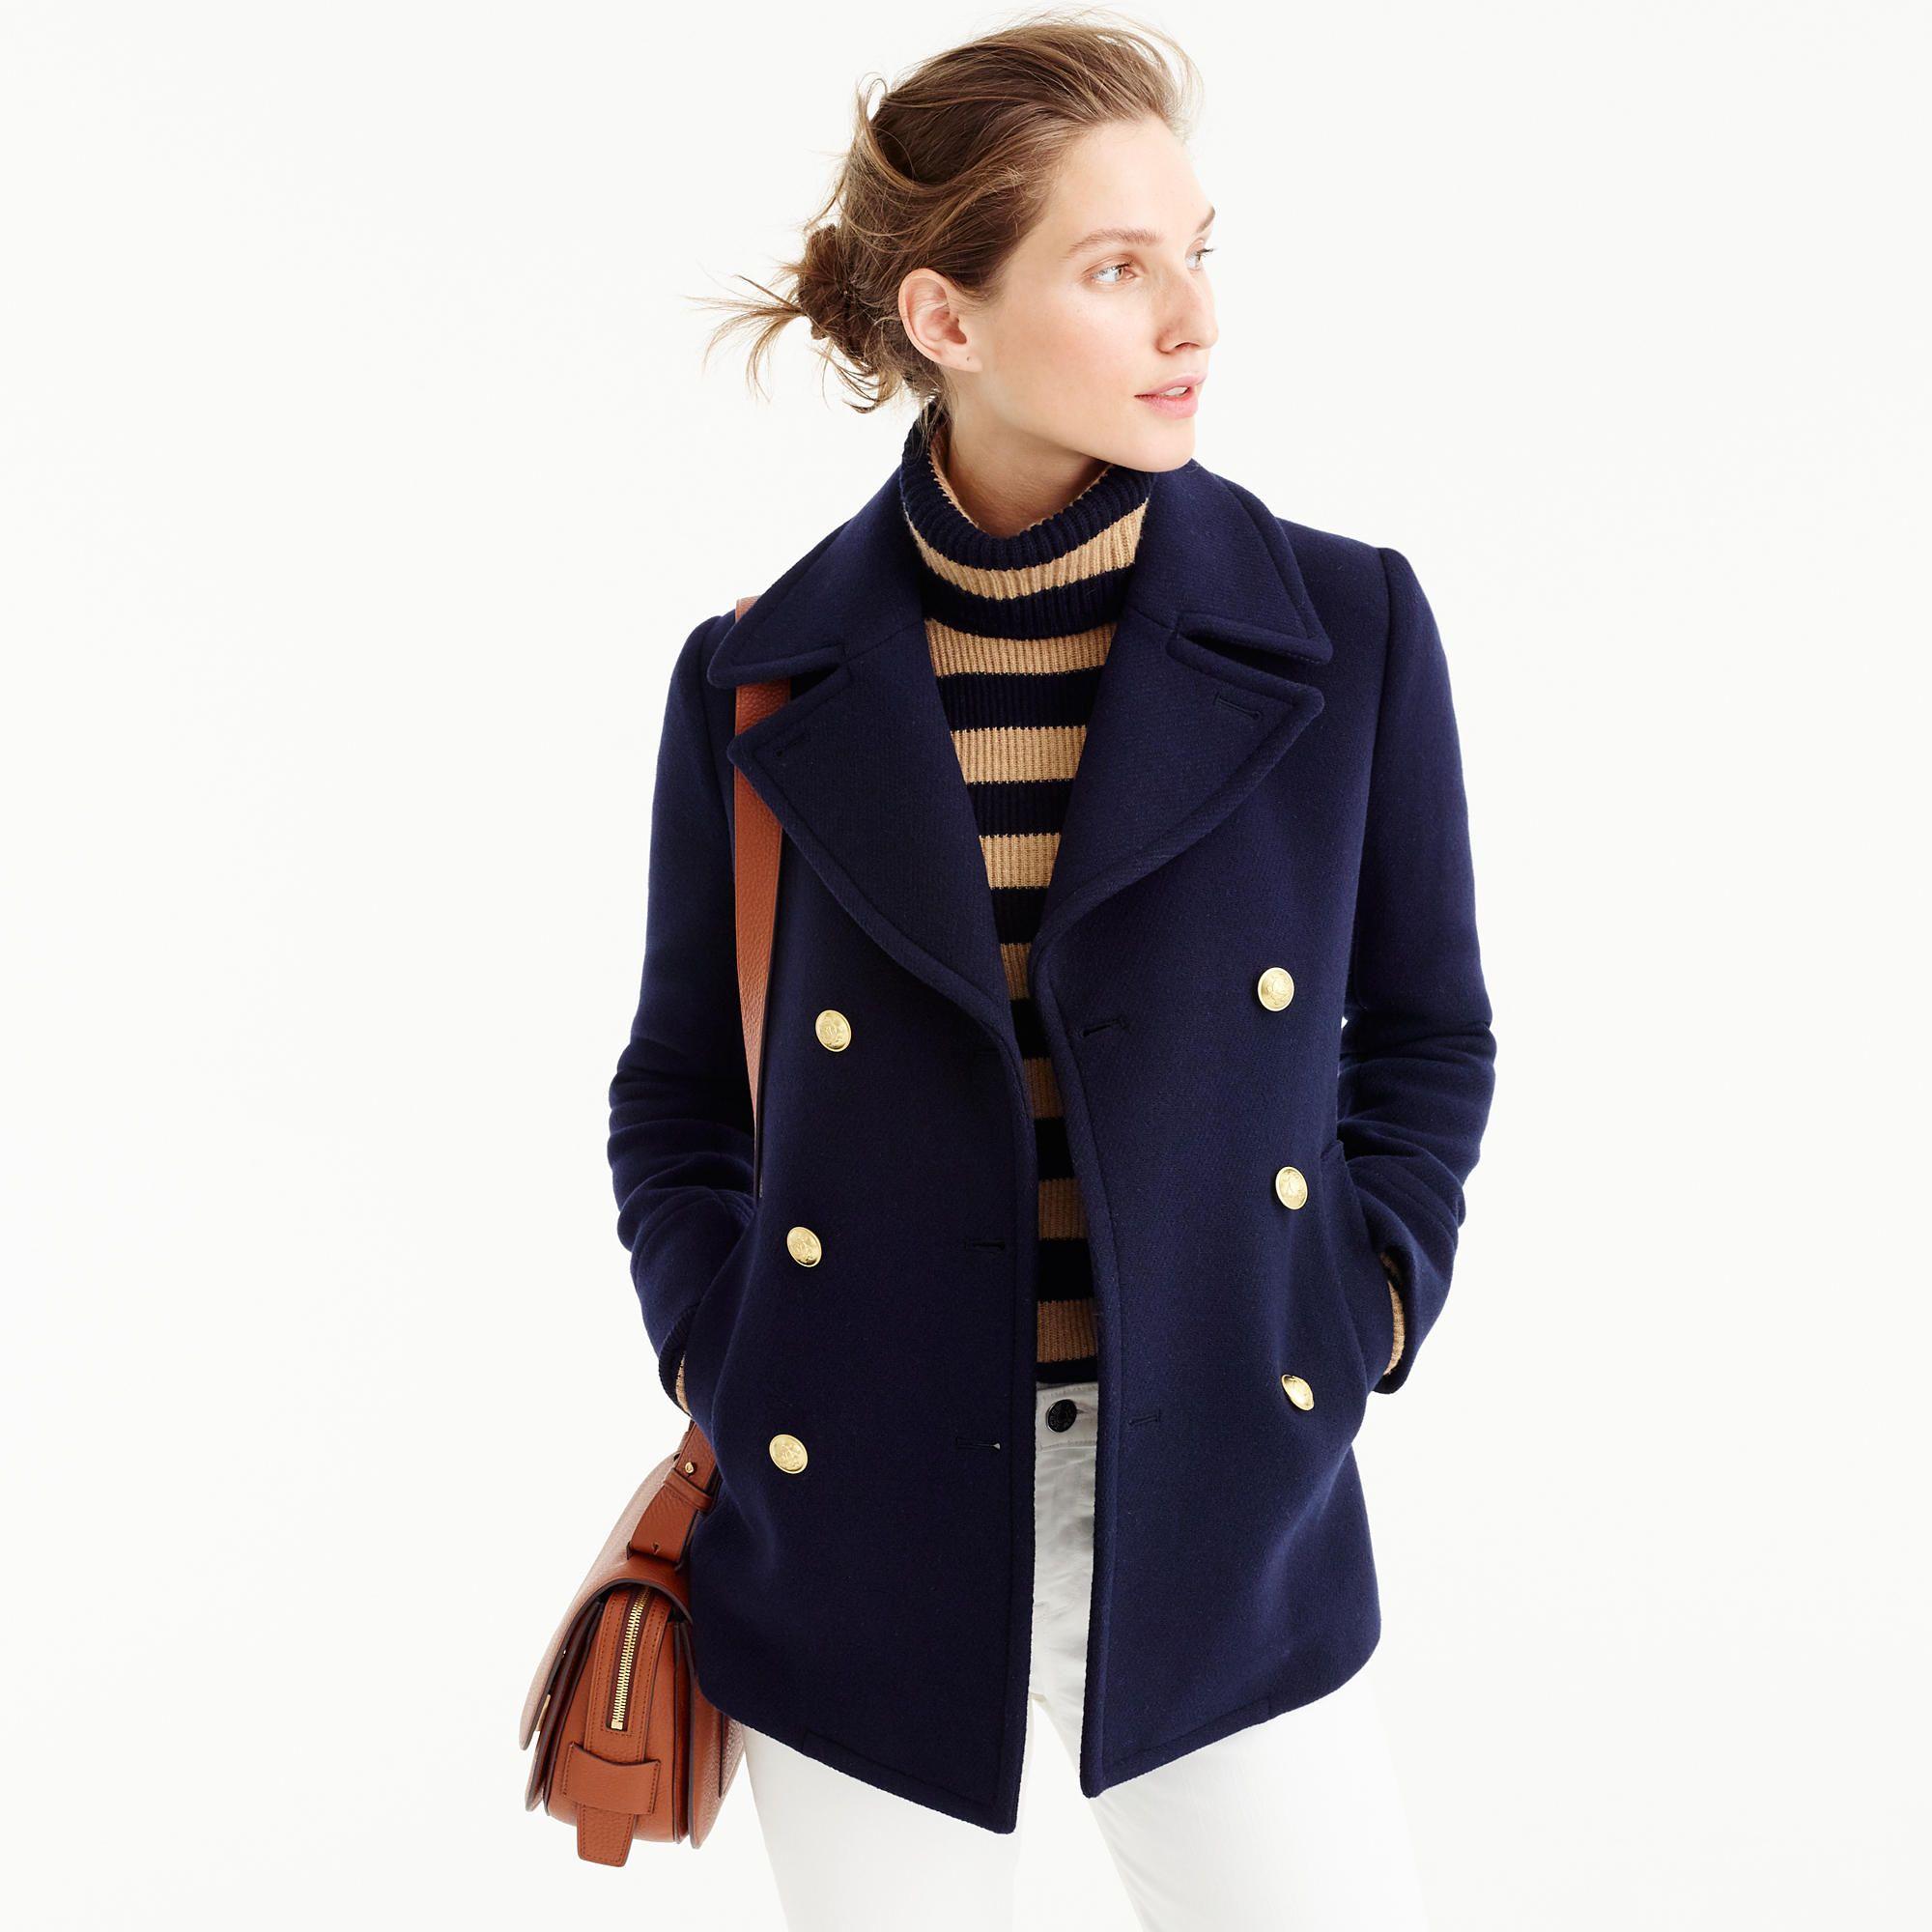 Majesty Peacoat : Women's Coats & Jackets | J.Crew | 2018 Spring ...